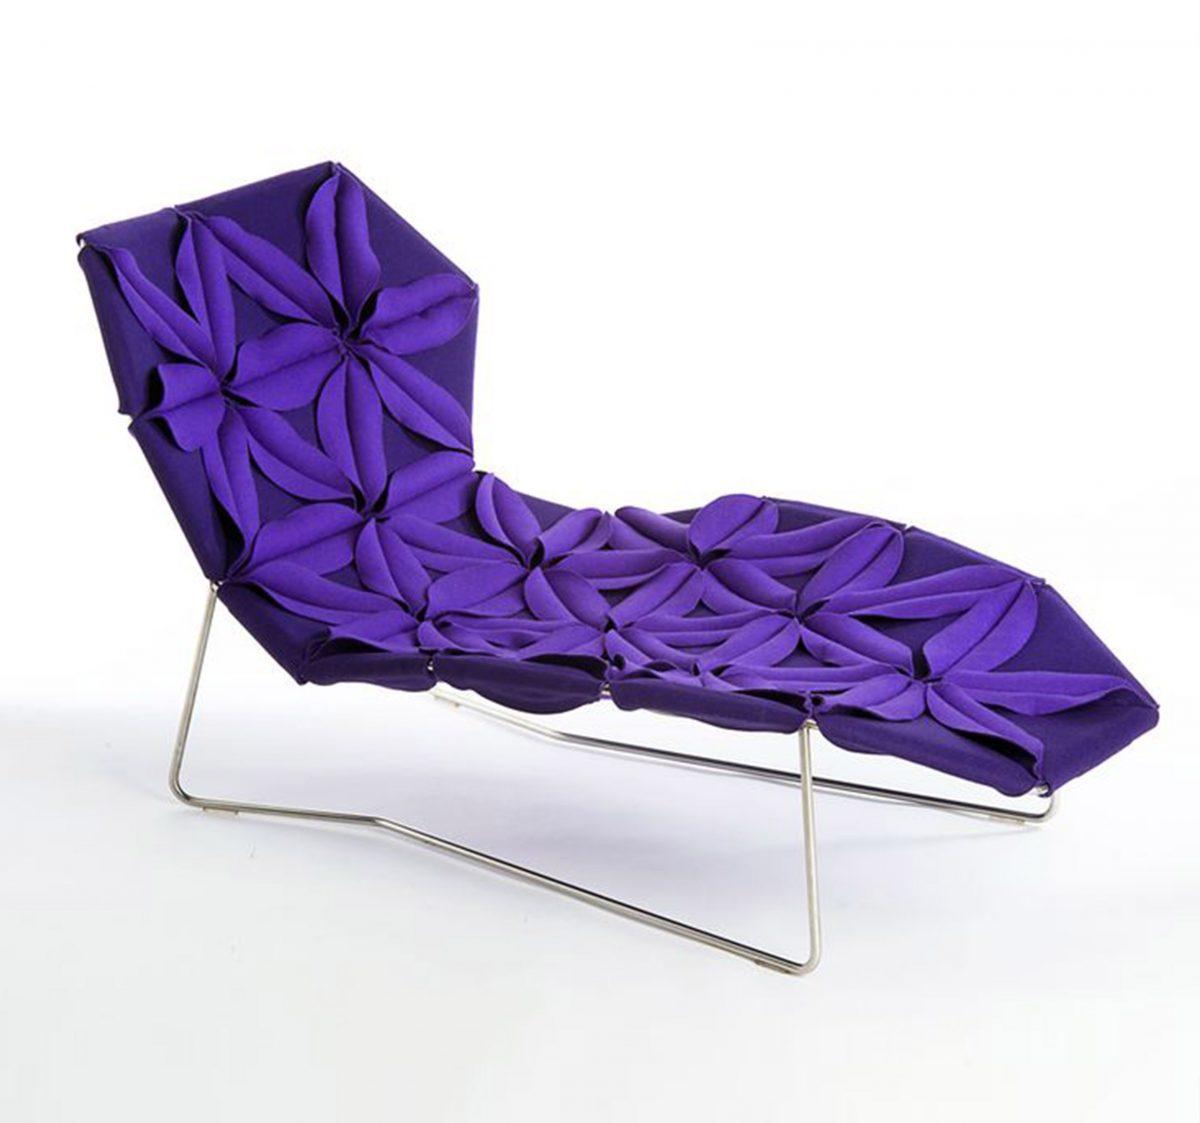 2. Antiboldi lounge chair, Patricia Urquiola for Moroso